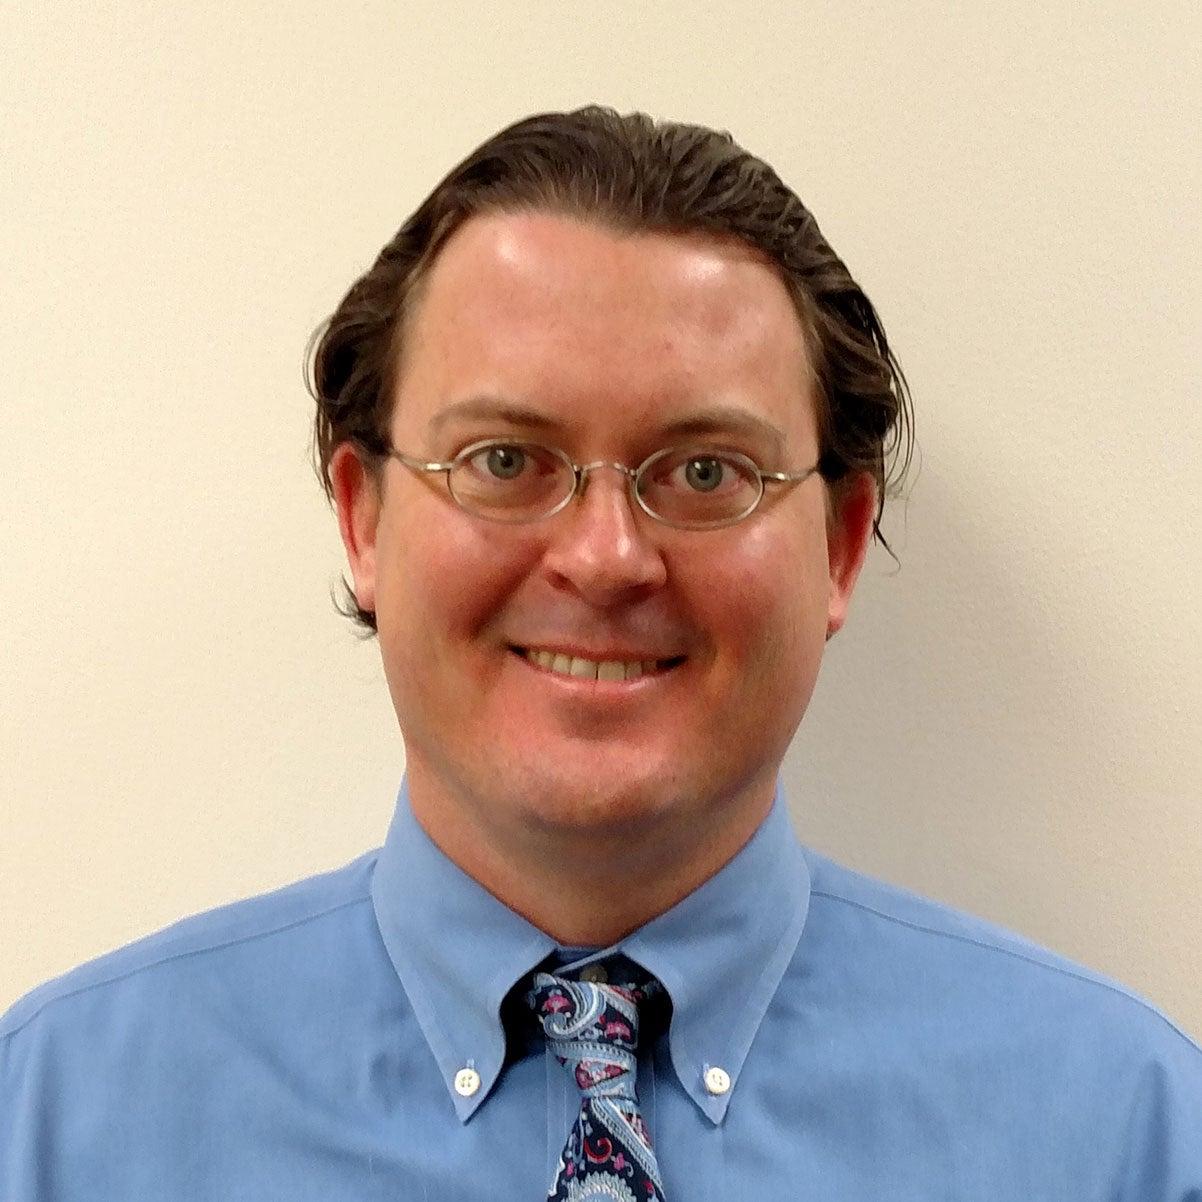 Patrick B. O'Neal, MD